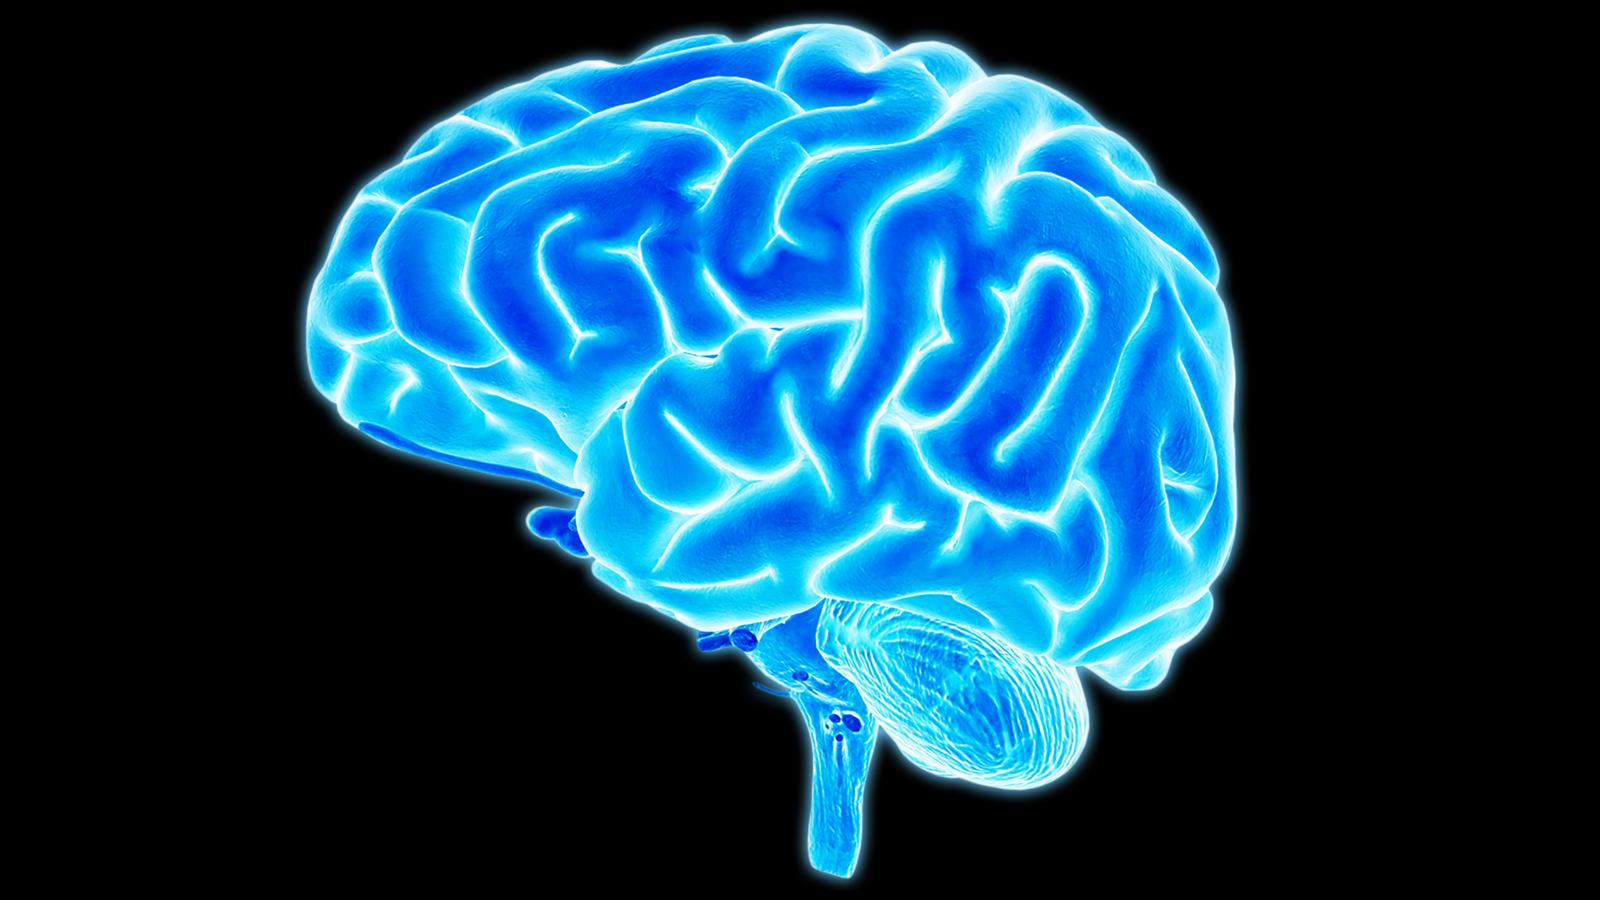 Brain HD wallpapers, Desktop wallpaper - most viewed